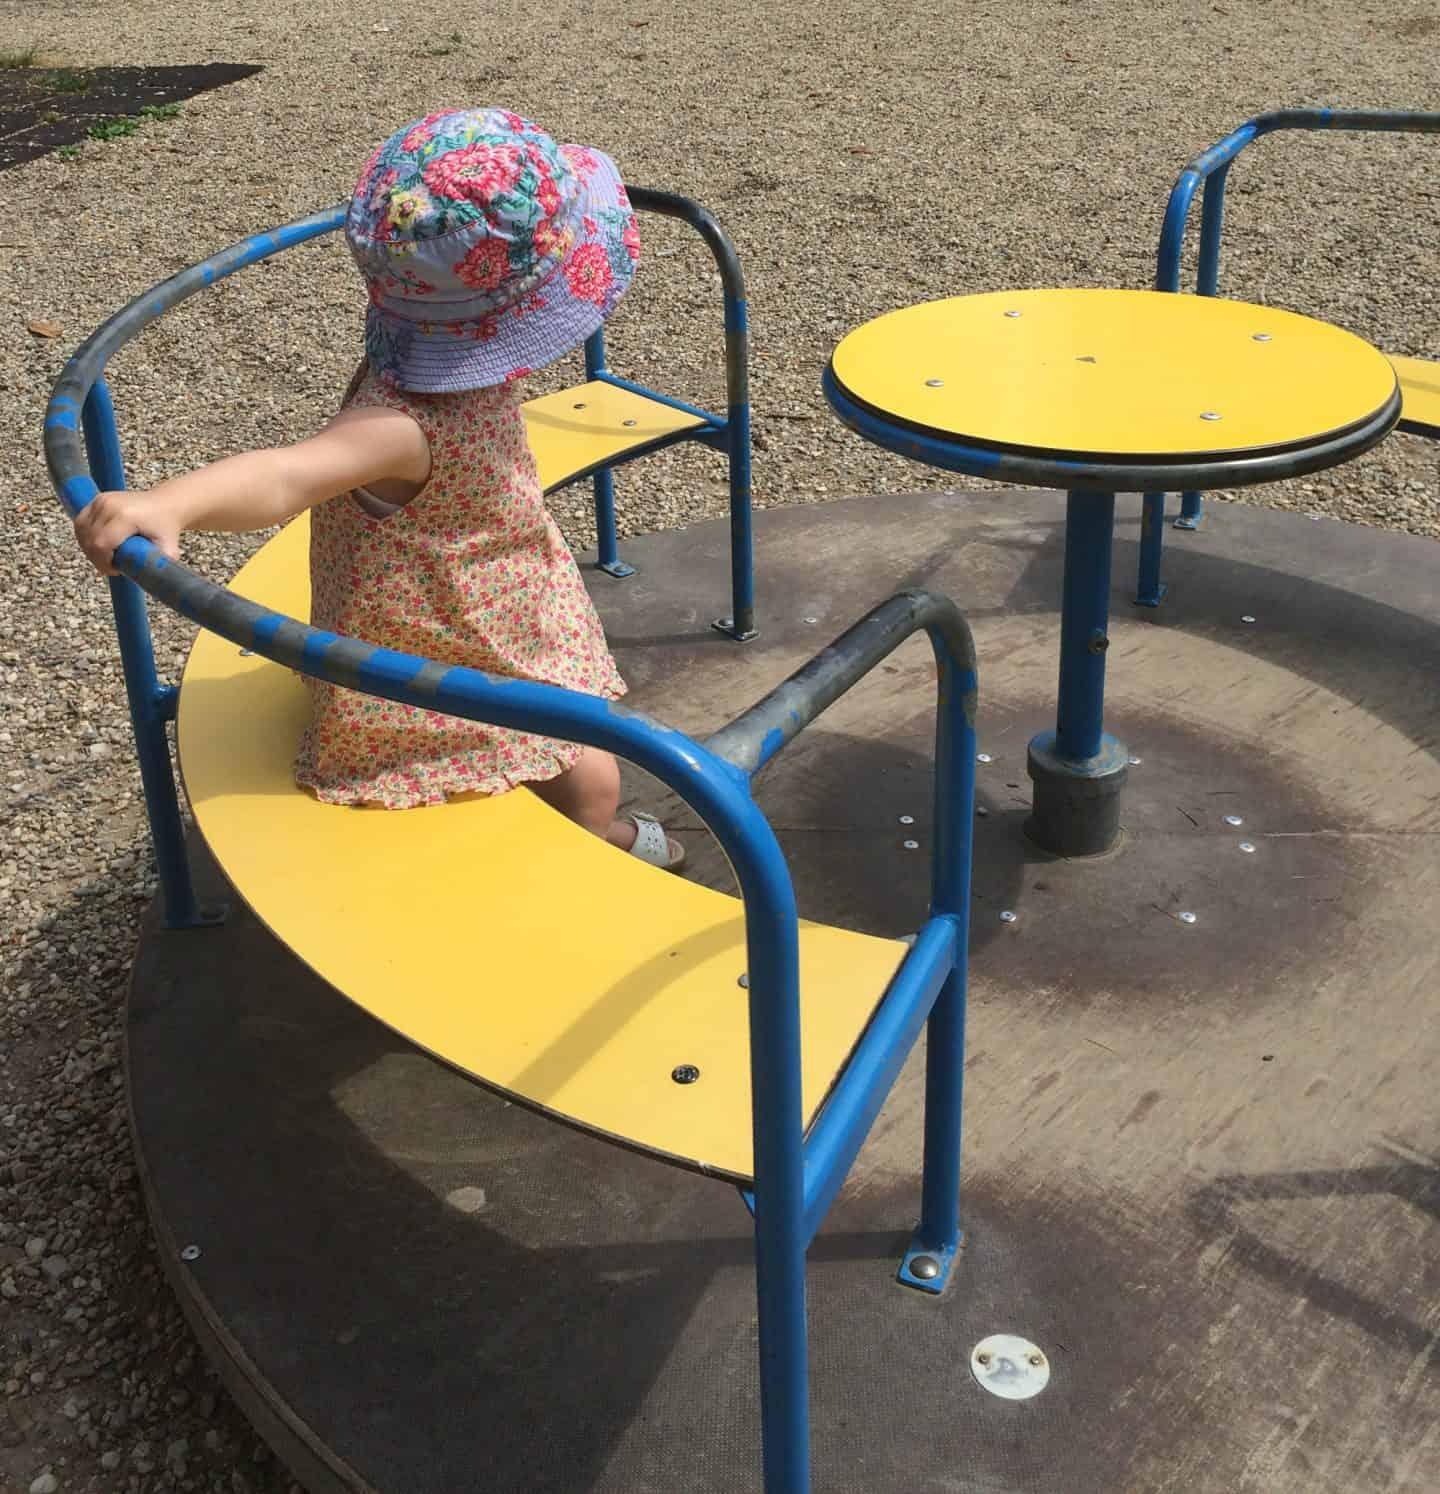 Find me a playground